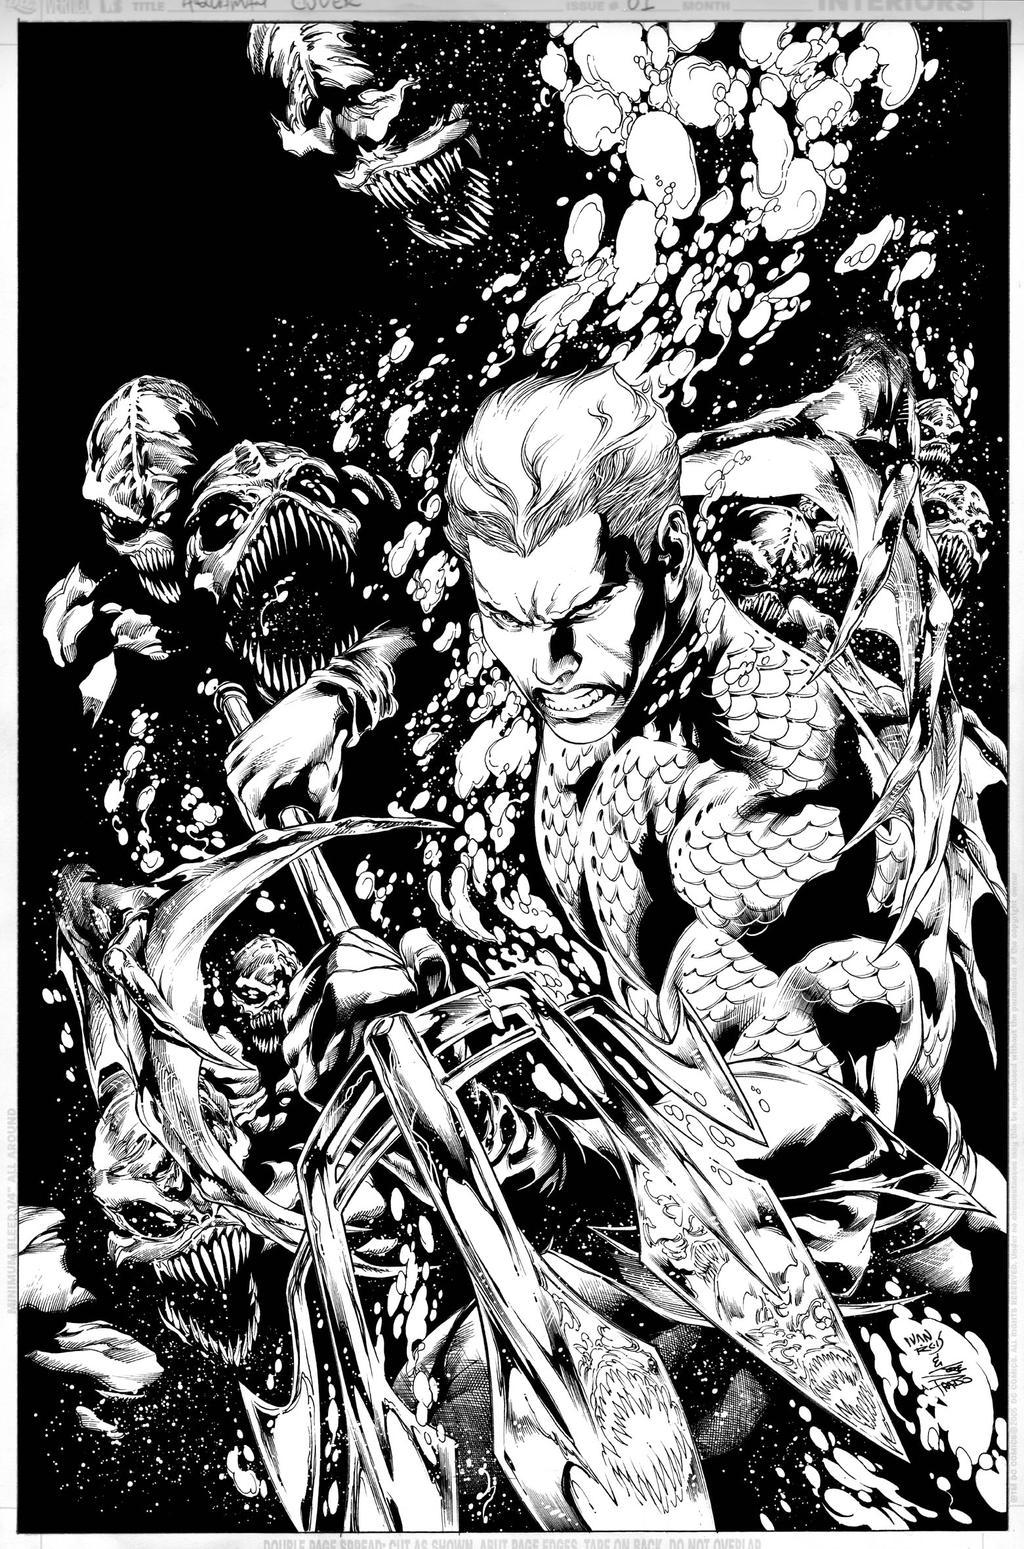 AQUAMAN Issue 01 COVER by JoePrado2010